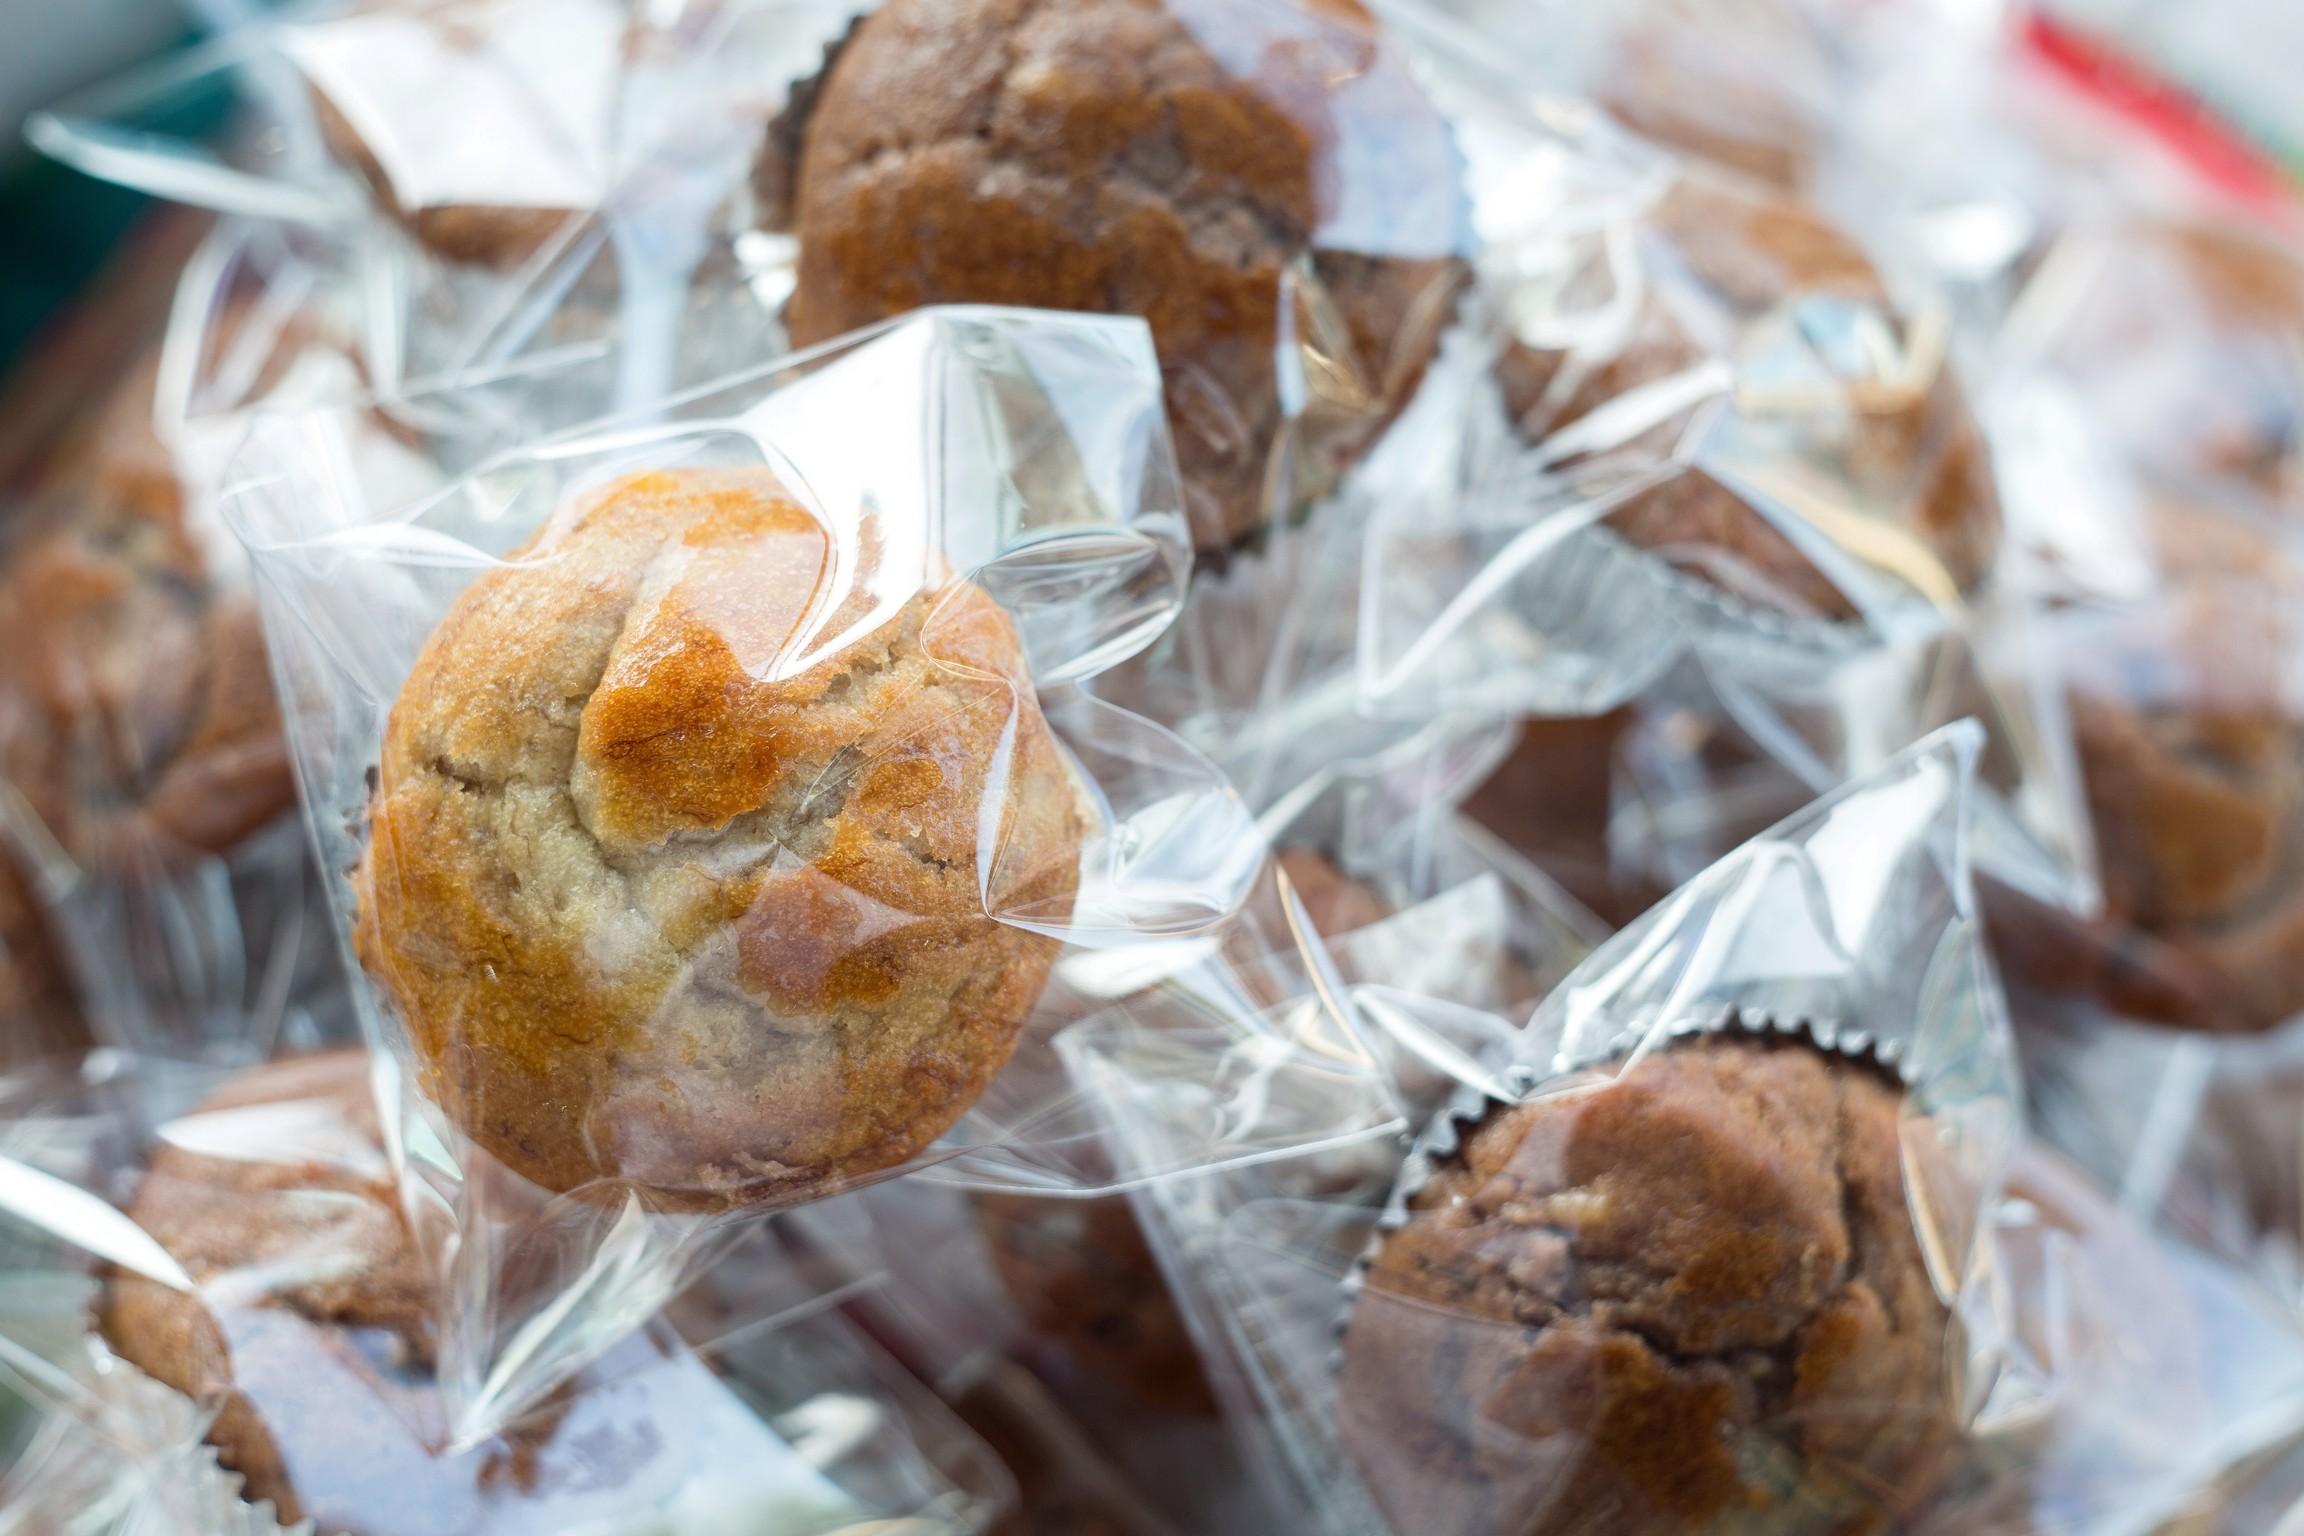 San Francisco Bay Area Grab-and-Go Snacks | Break Room | Healthy Vending | Workplace Culture